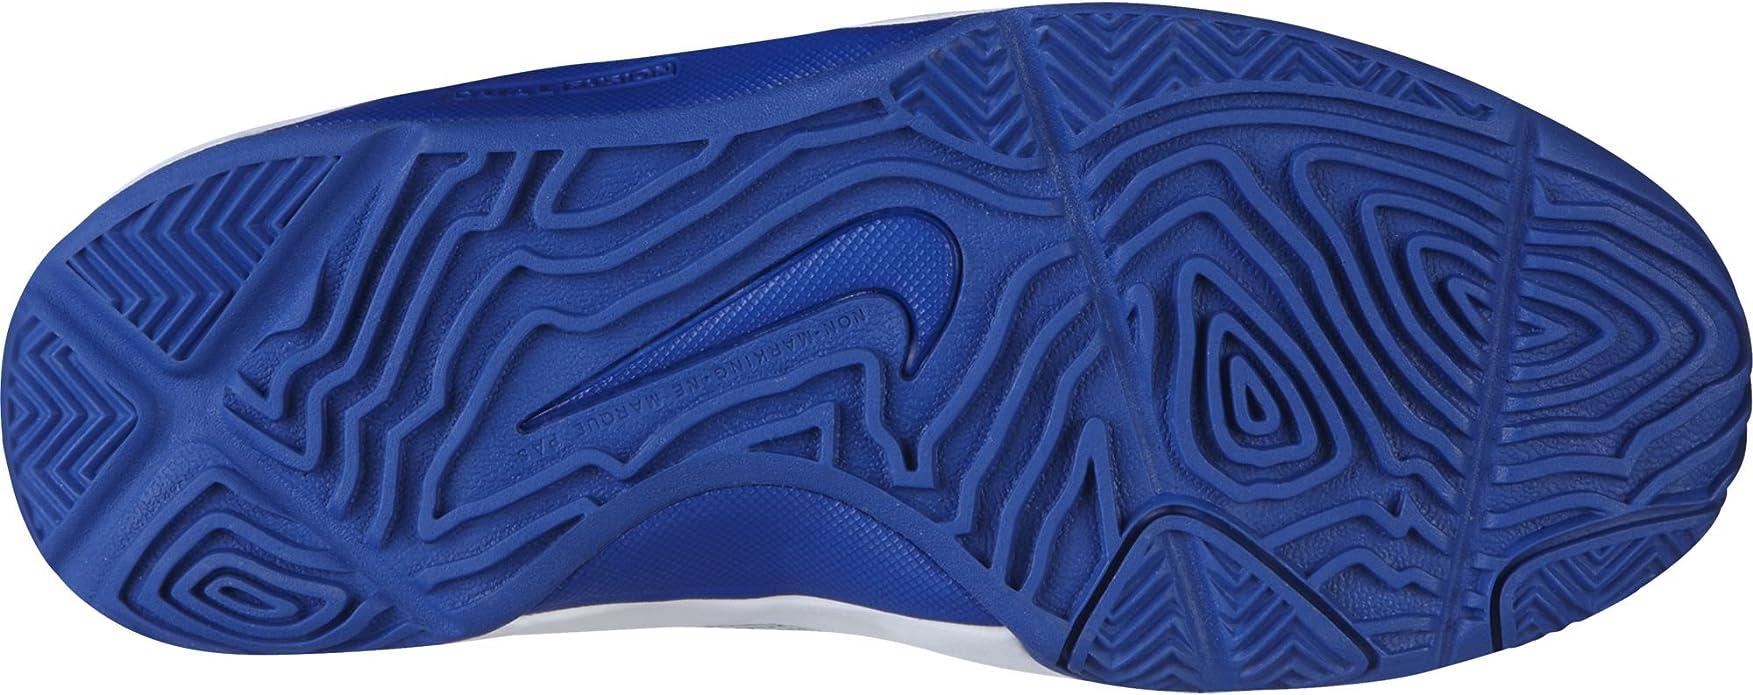 Nike Dual Fusion BB 2, Scarpe da Basket Bambino, Bianco  0tBH5N